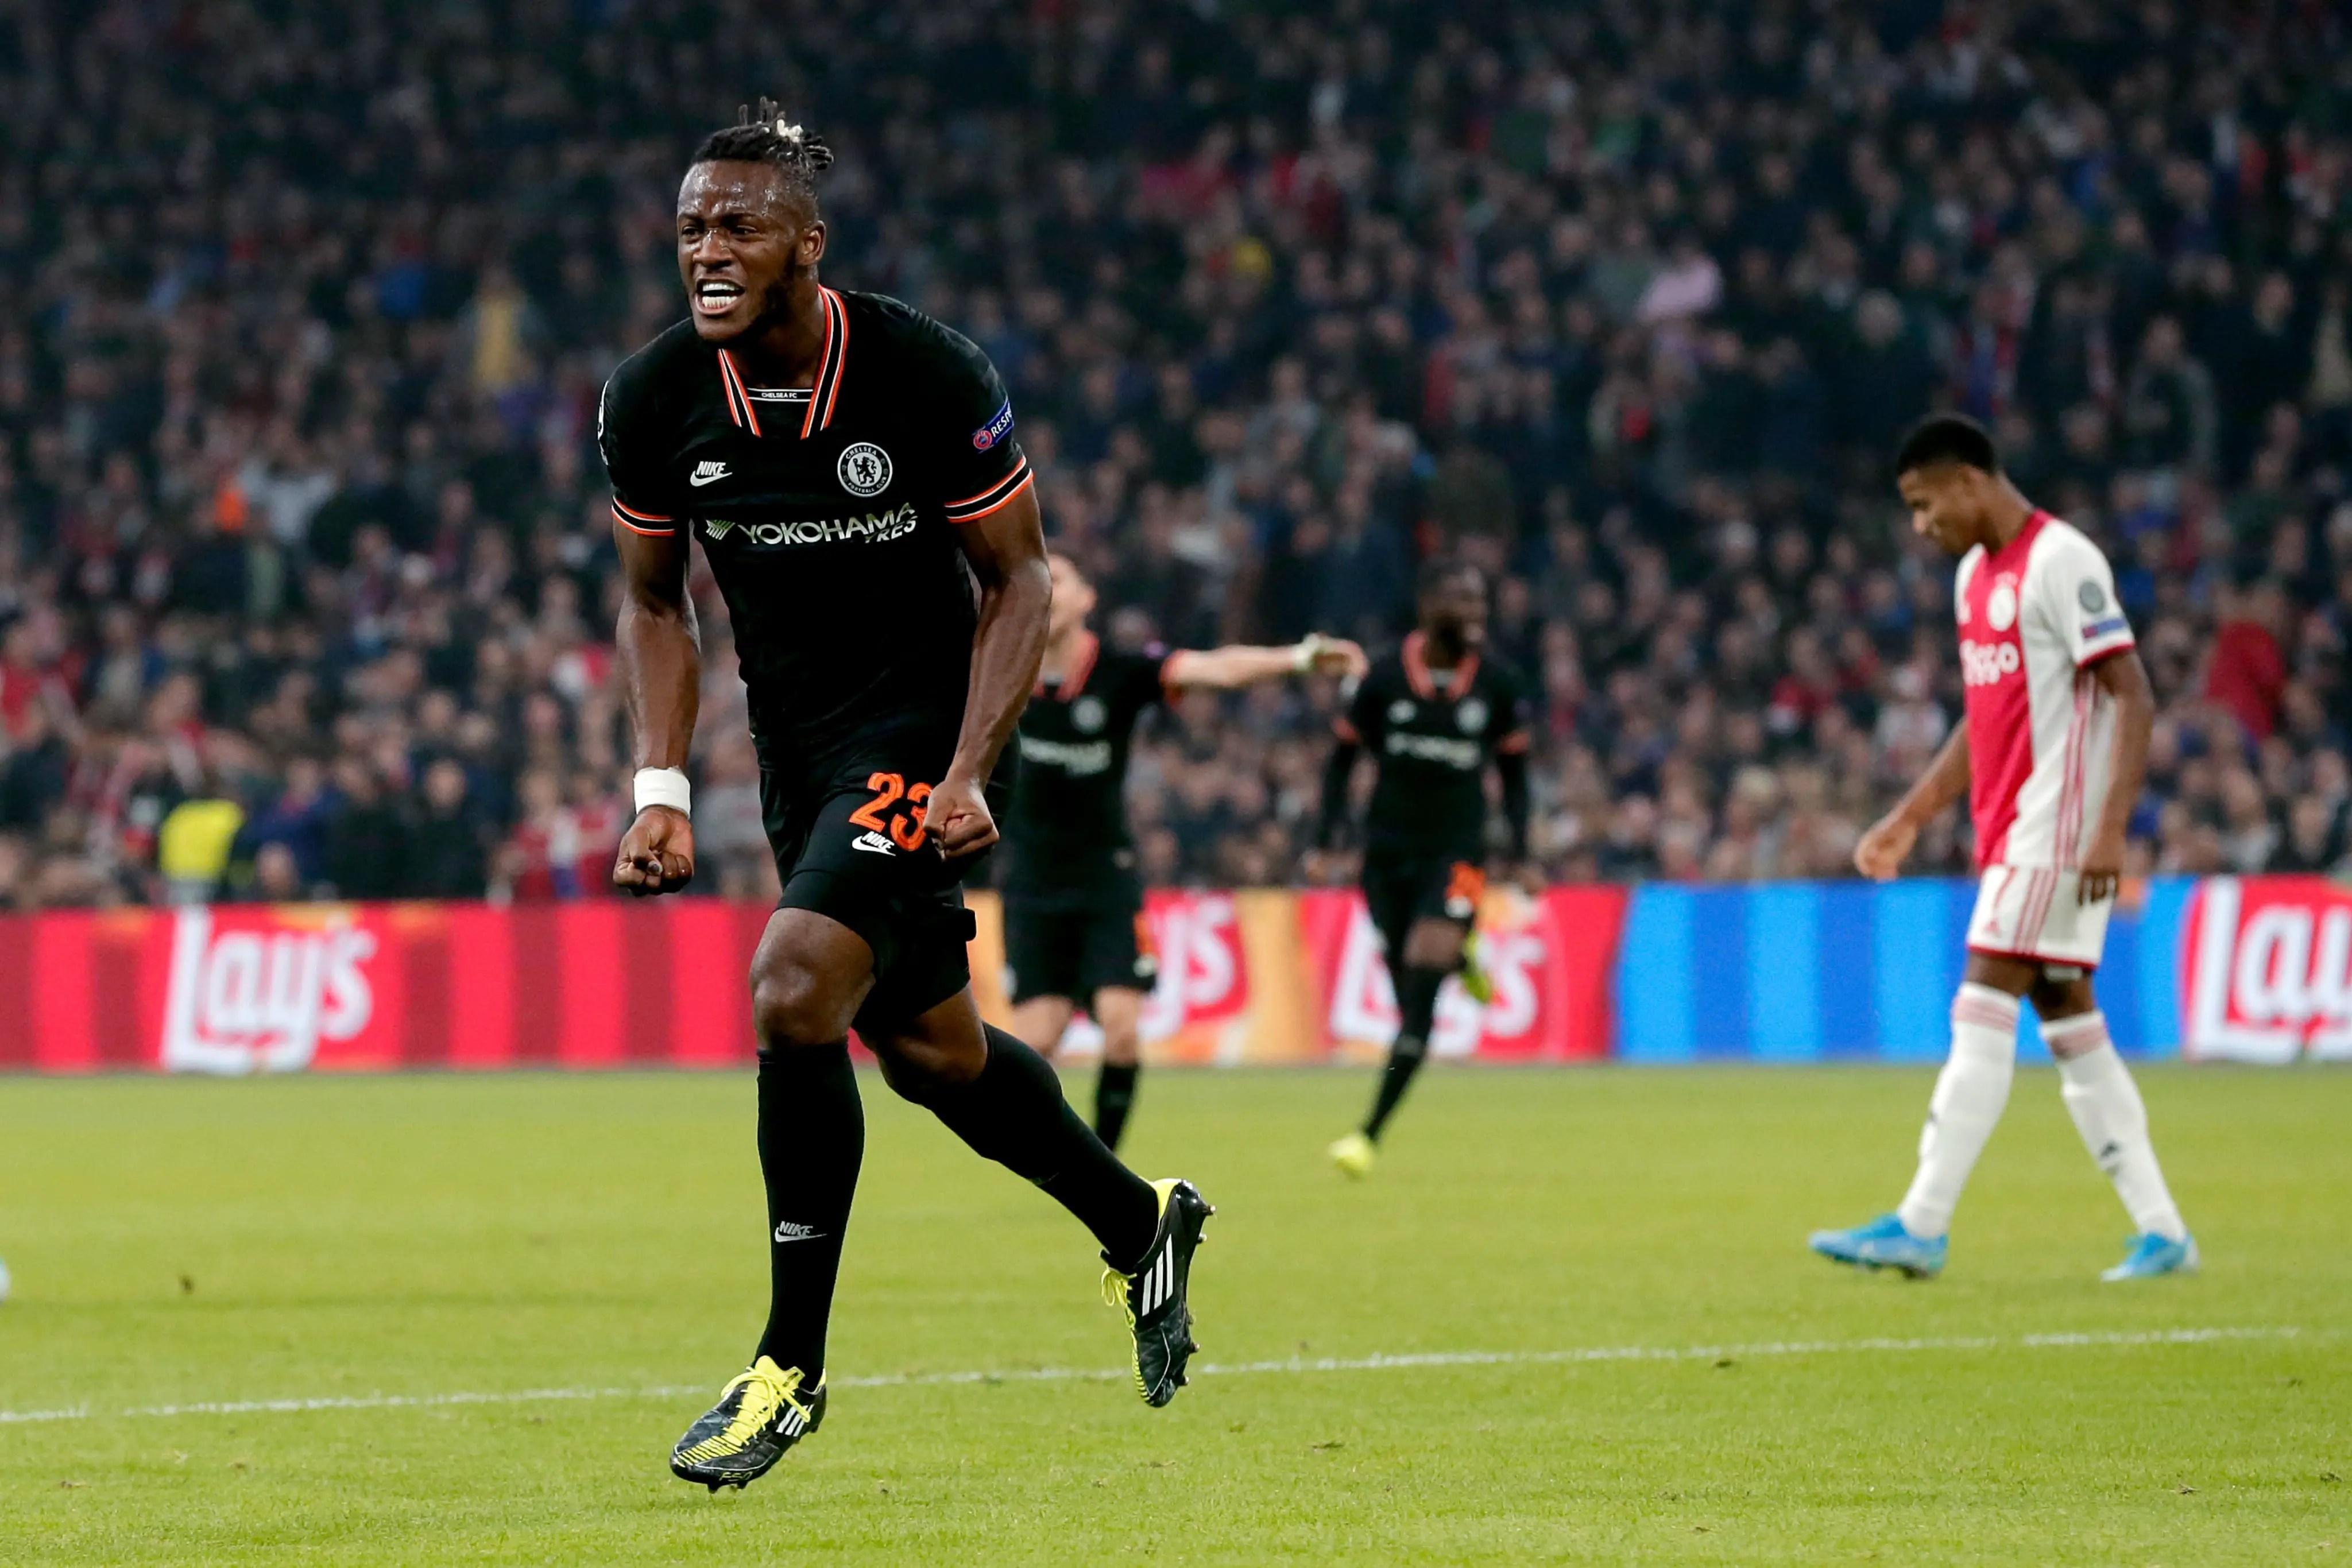 UCL: Super sub Batshuayi Scores Winner As Chelsea Pip Ajax In Amsterdam